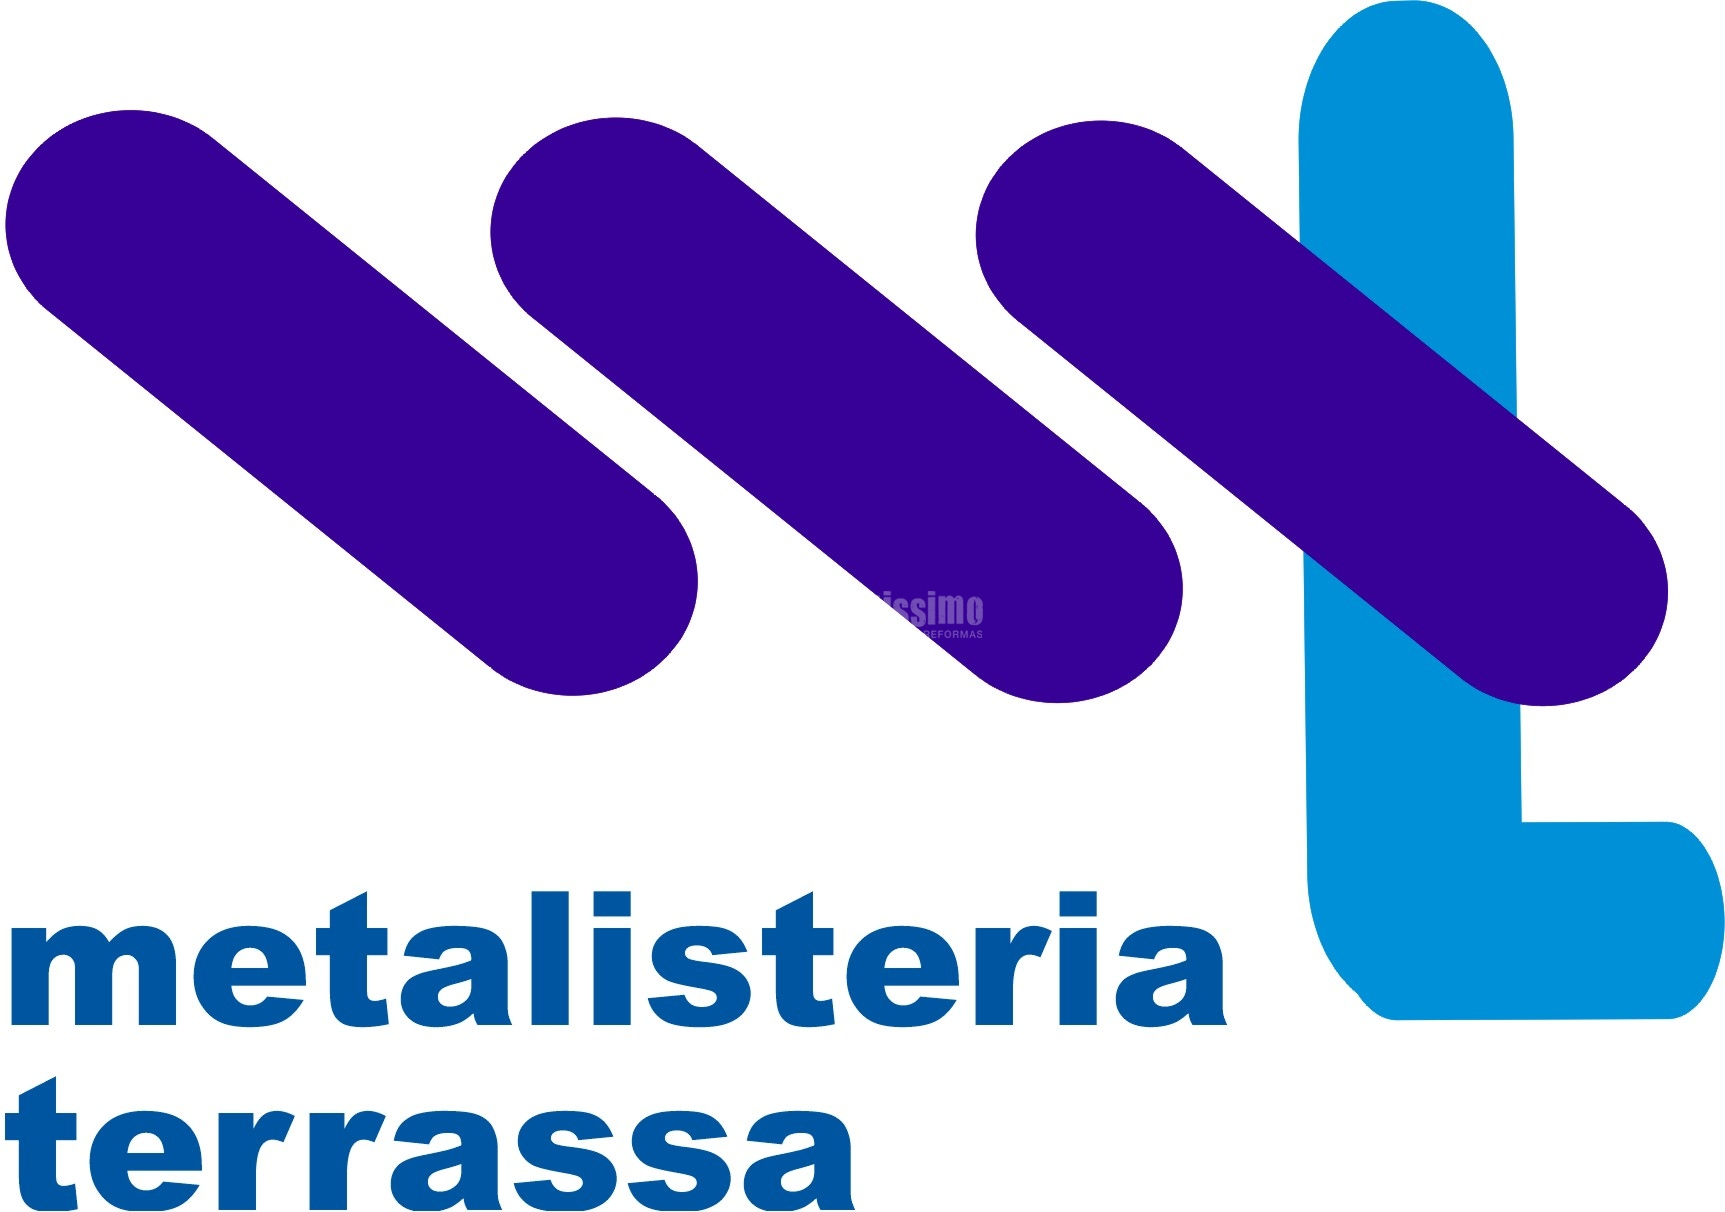 Metalisteria Terrassa